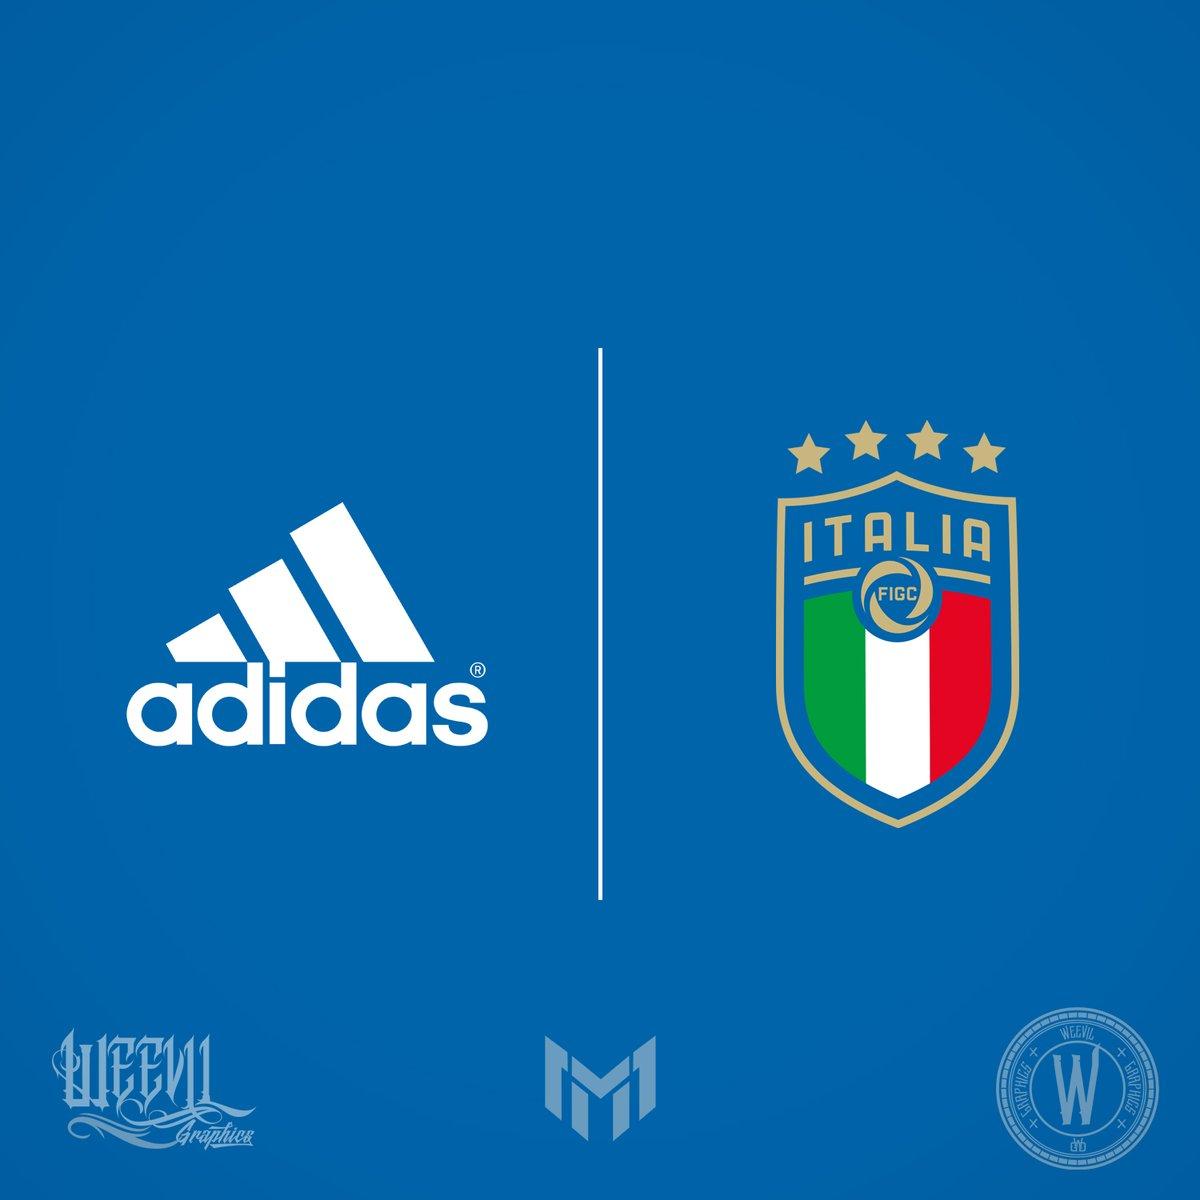 adidas italia hashtag on Twitter